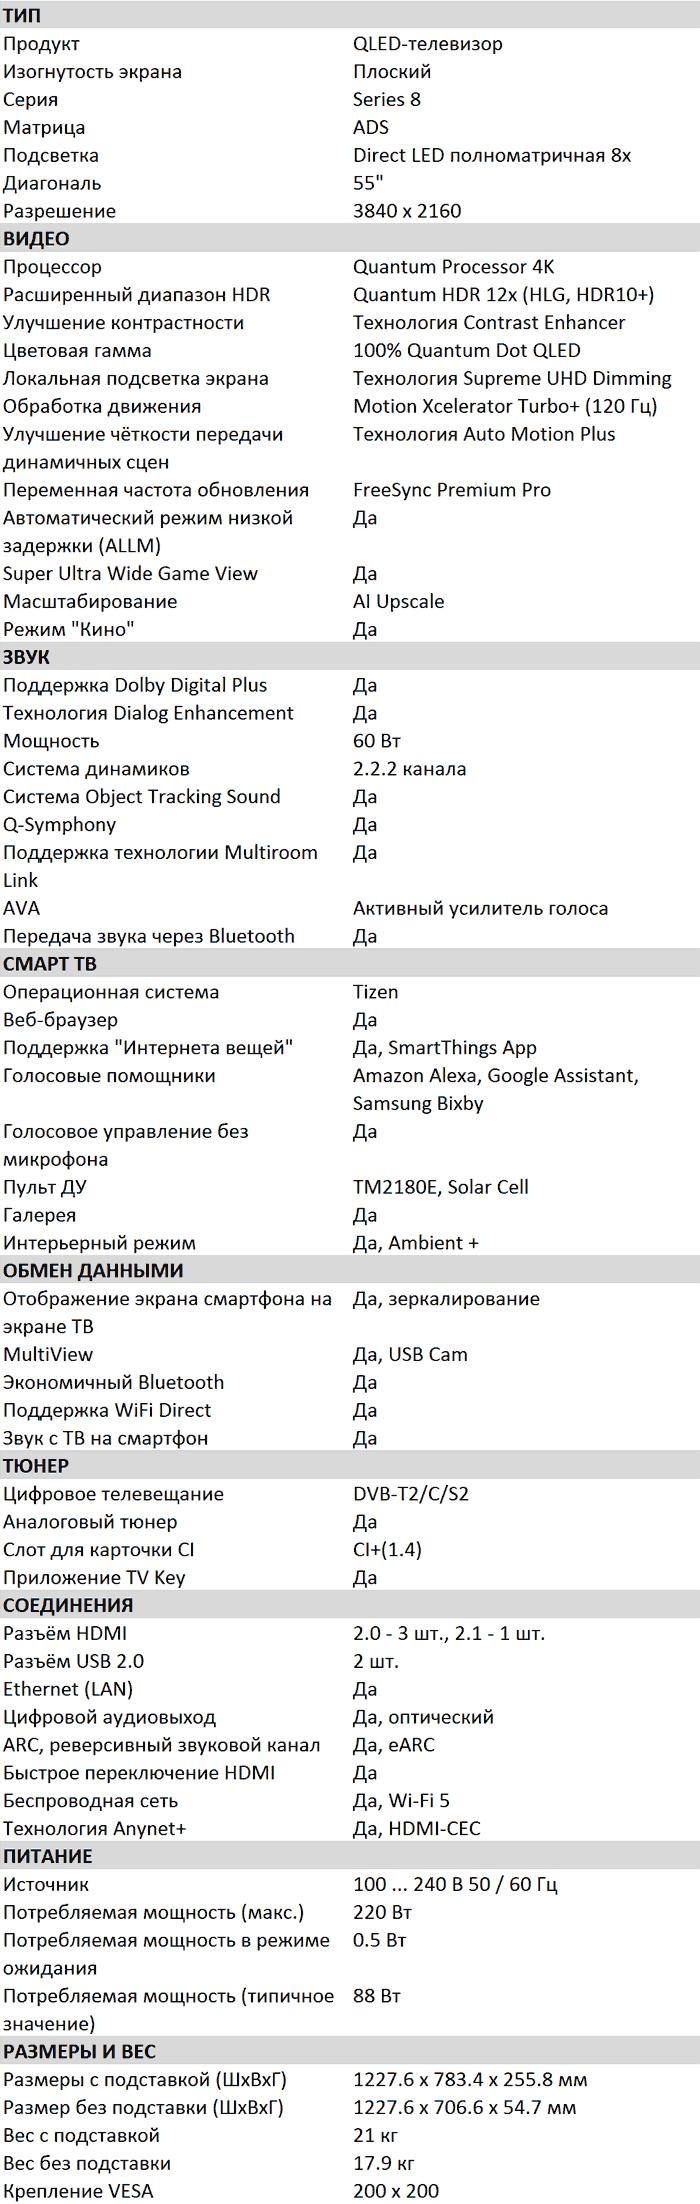 Характеристики Q80A